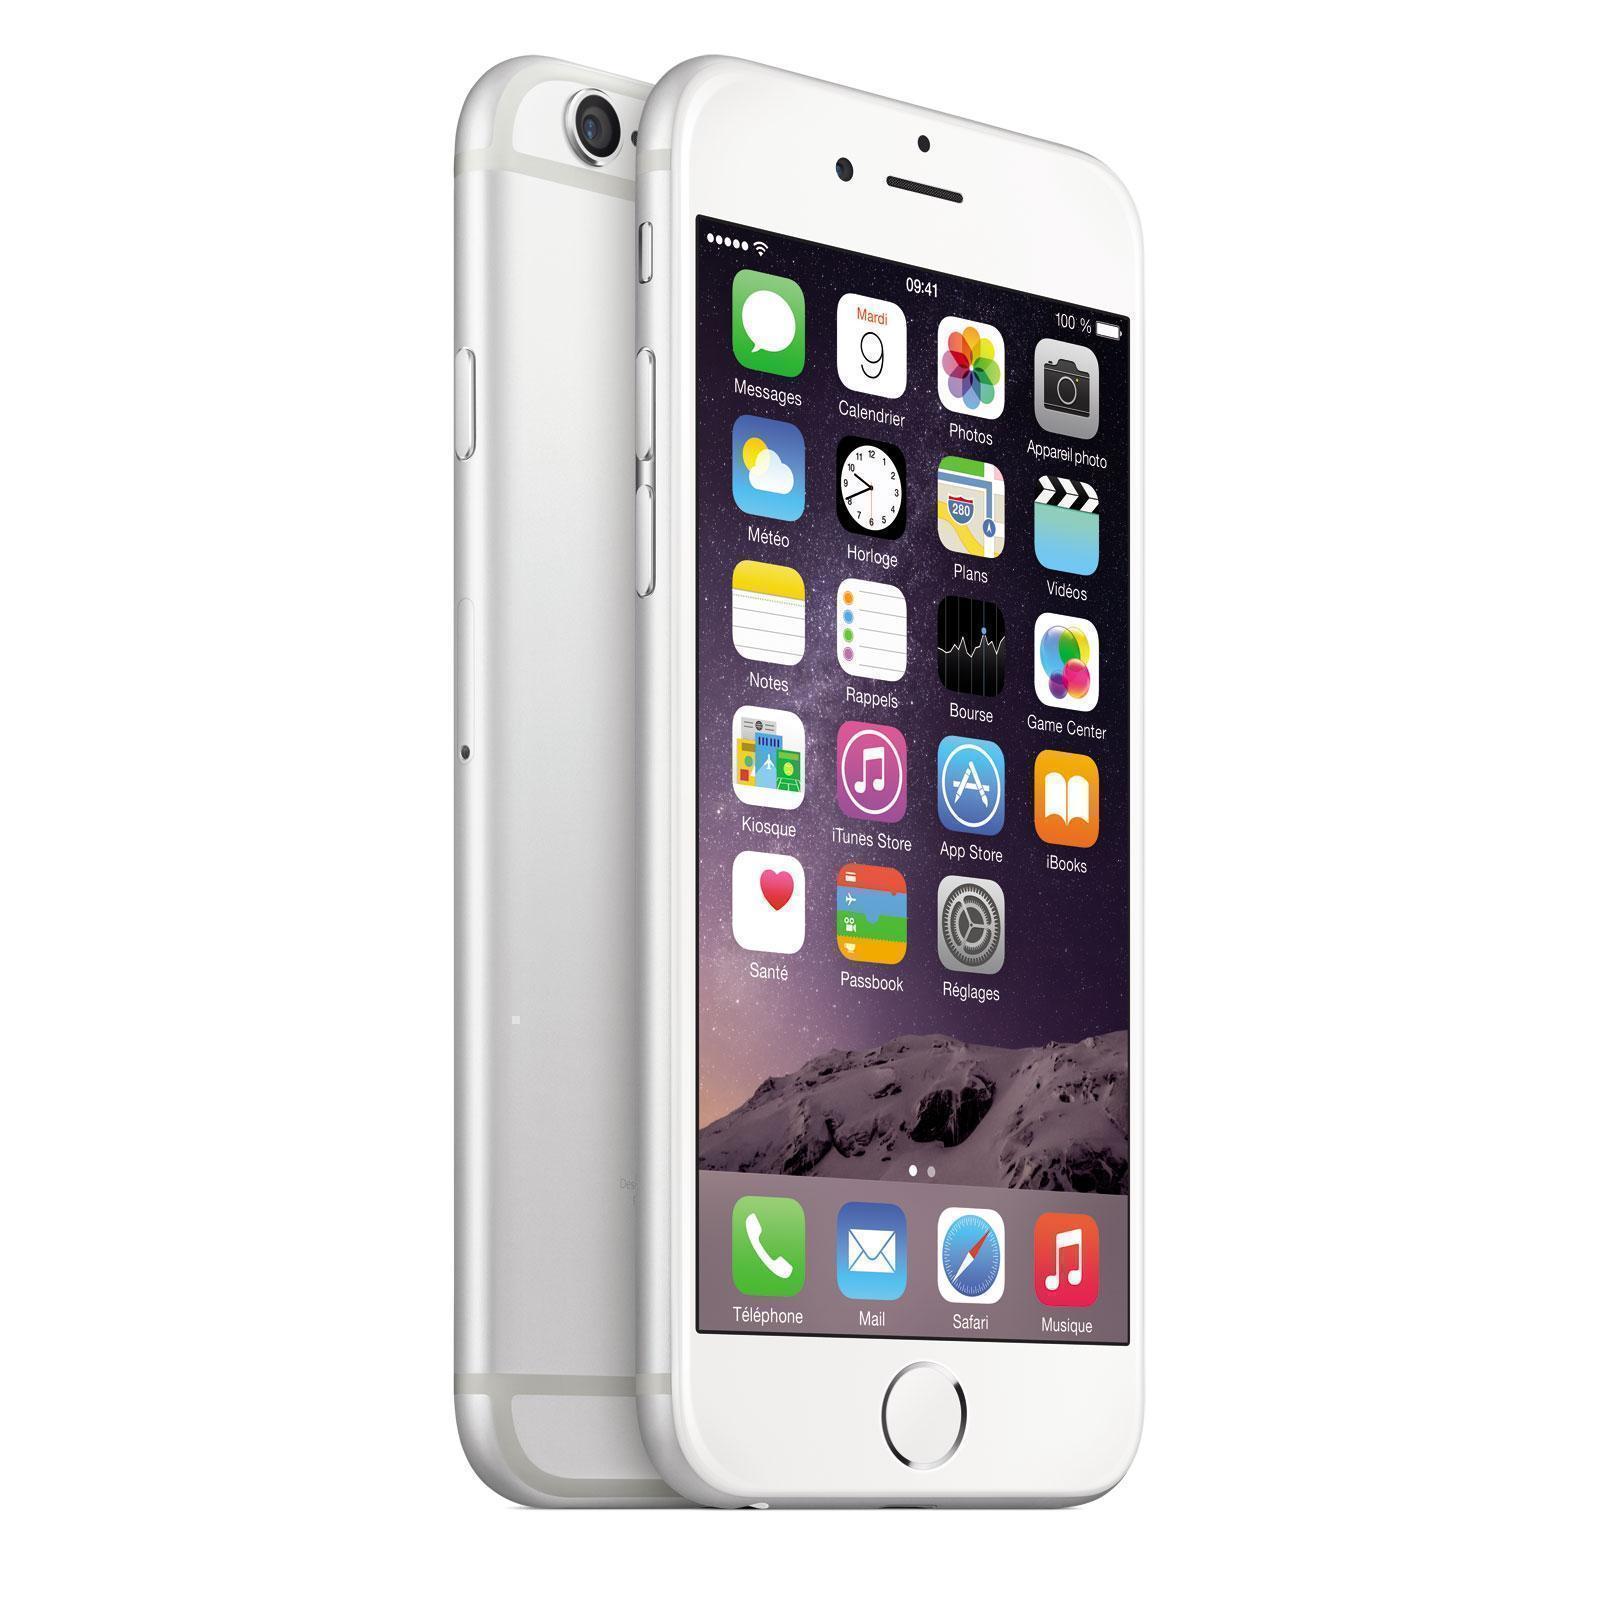 iPhone 6 16GB - Silber - Ohne Vertrag